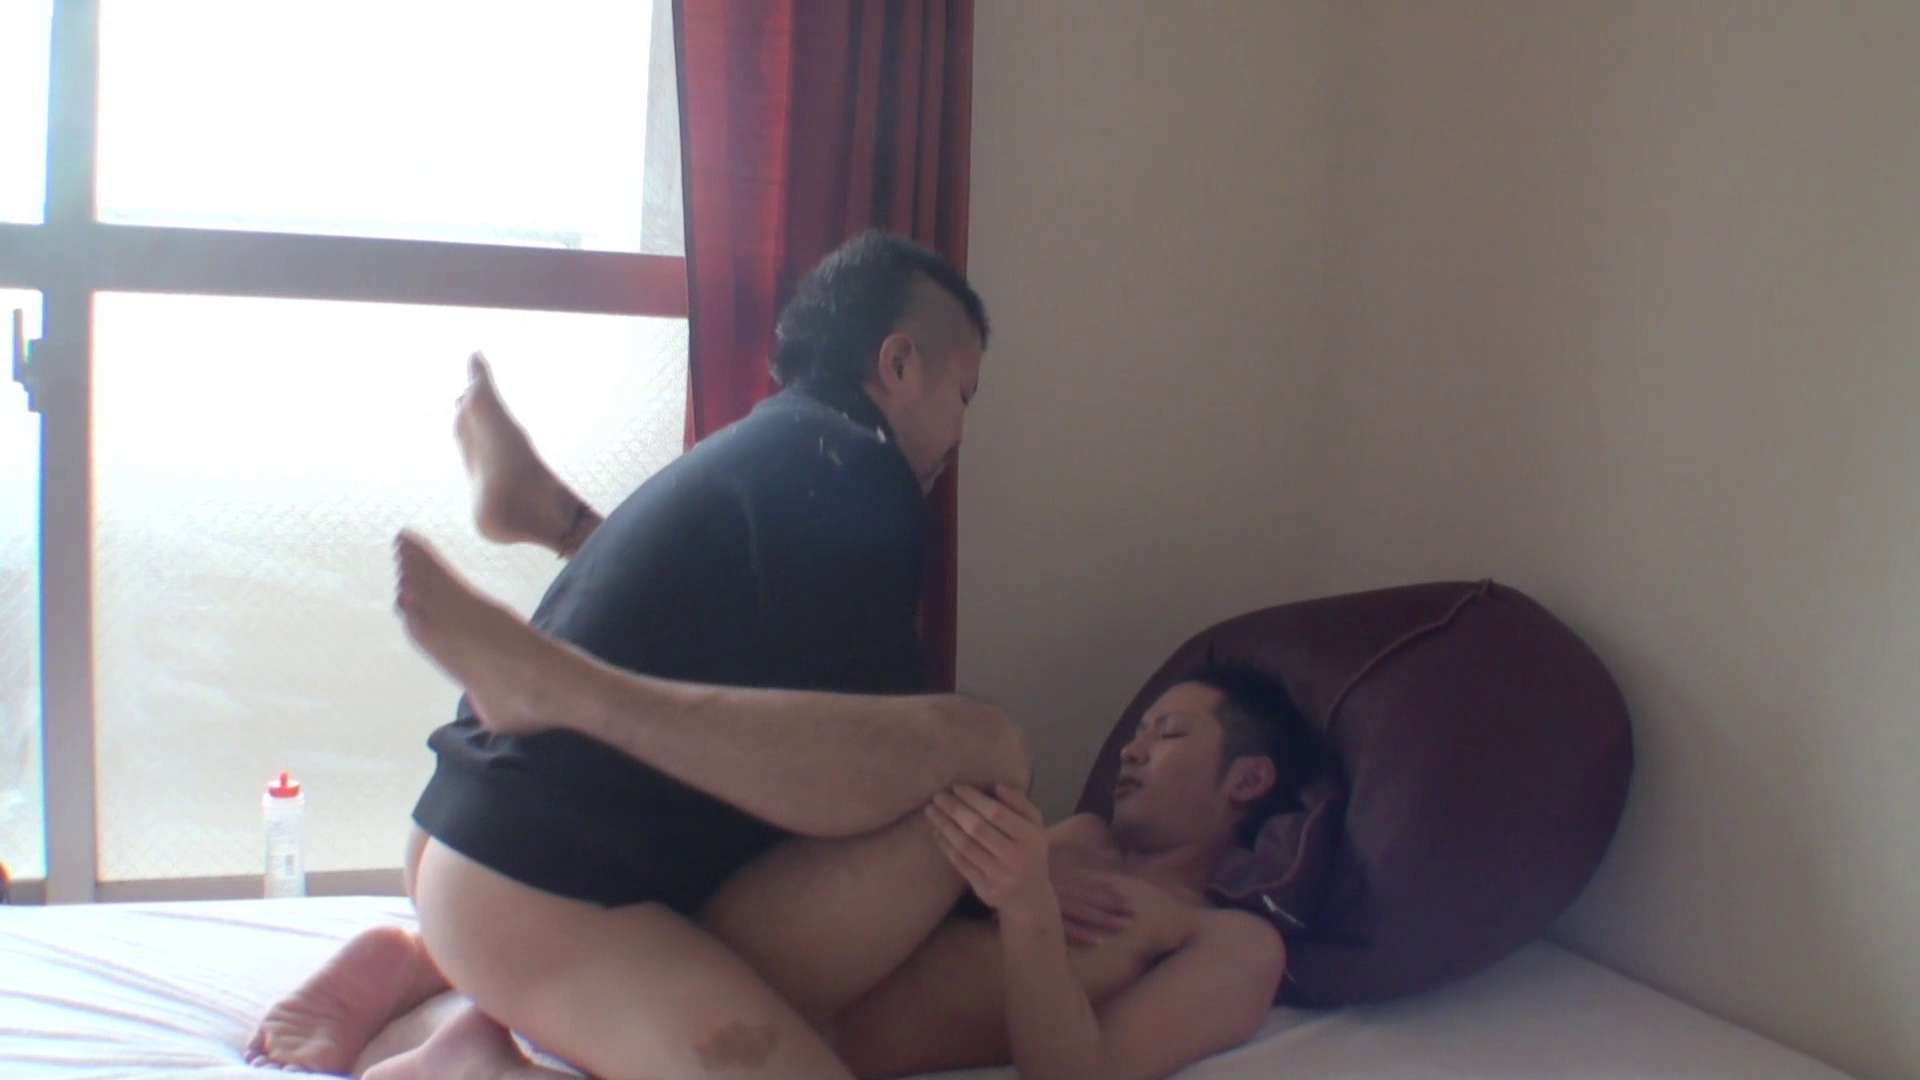 HD 良太と健二当たり前の日常 セックス編 菊指 ゲイエロビデオ画像 8画像 6